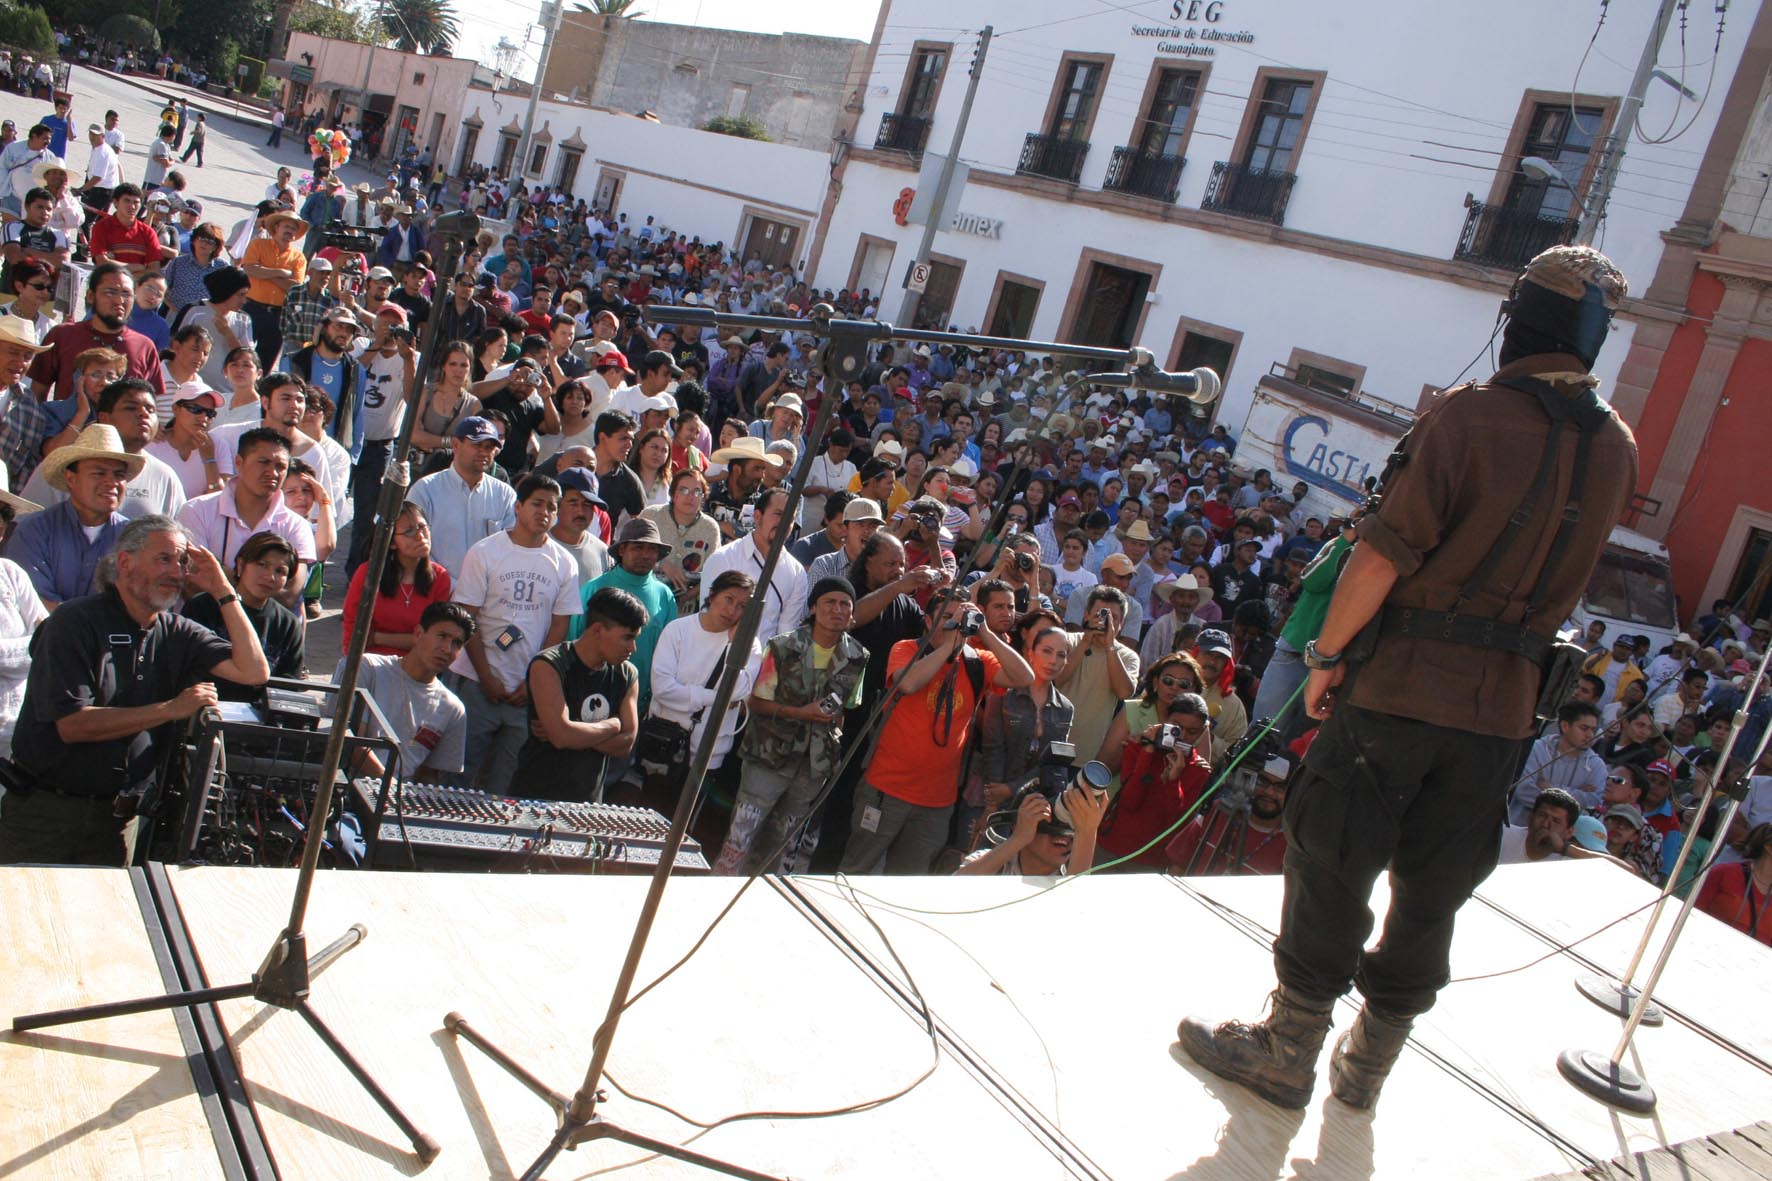 Suly San Luis De La Paz free xnxx